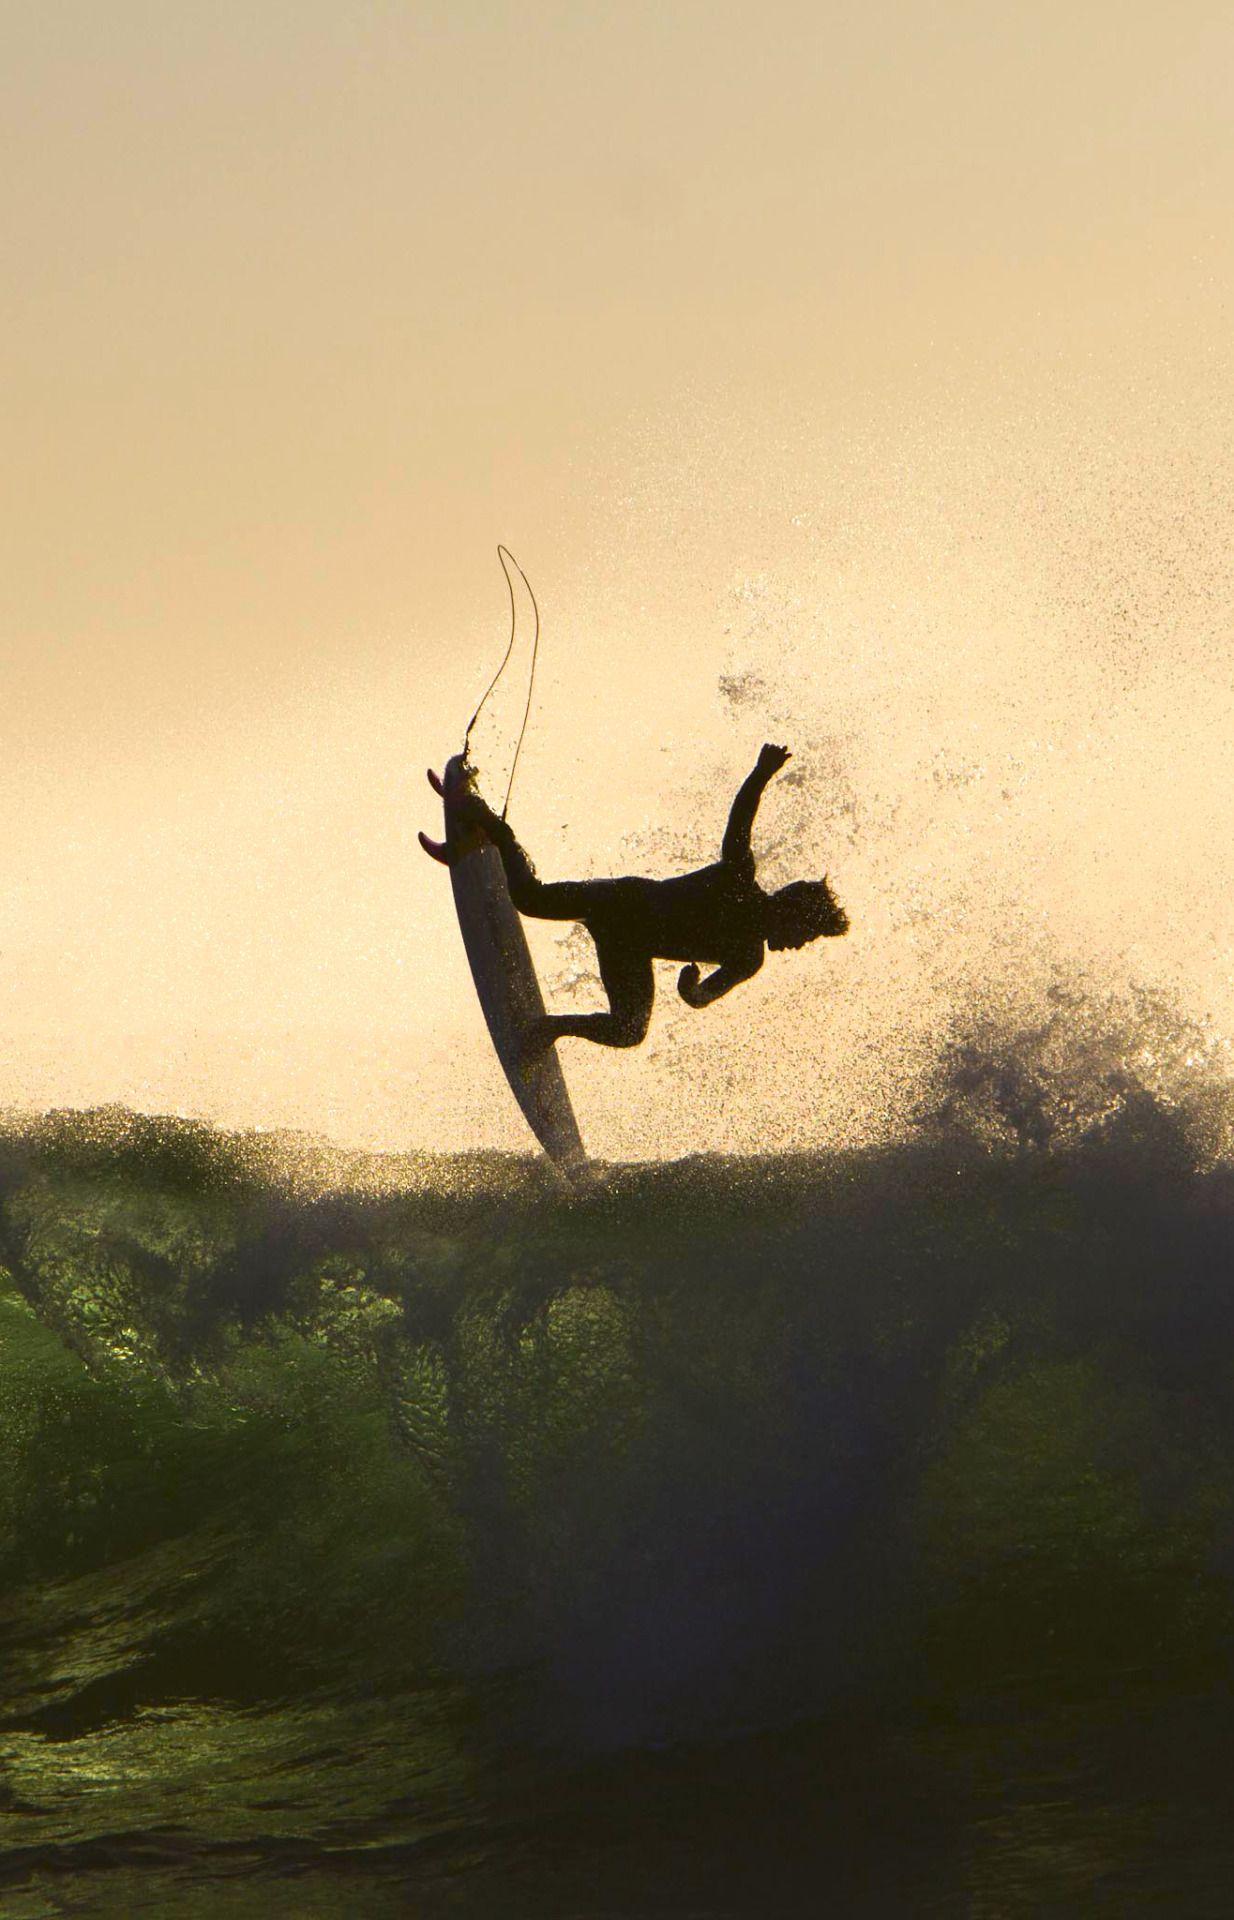 F&O wslofficial Hands free. Surfer